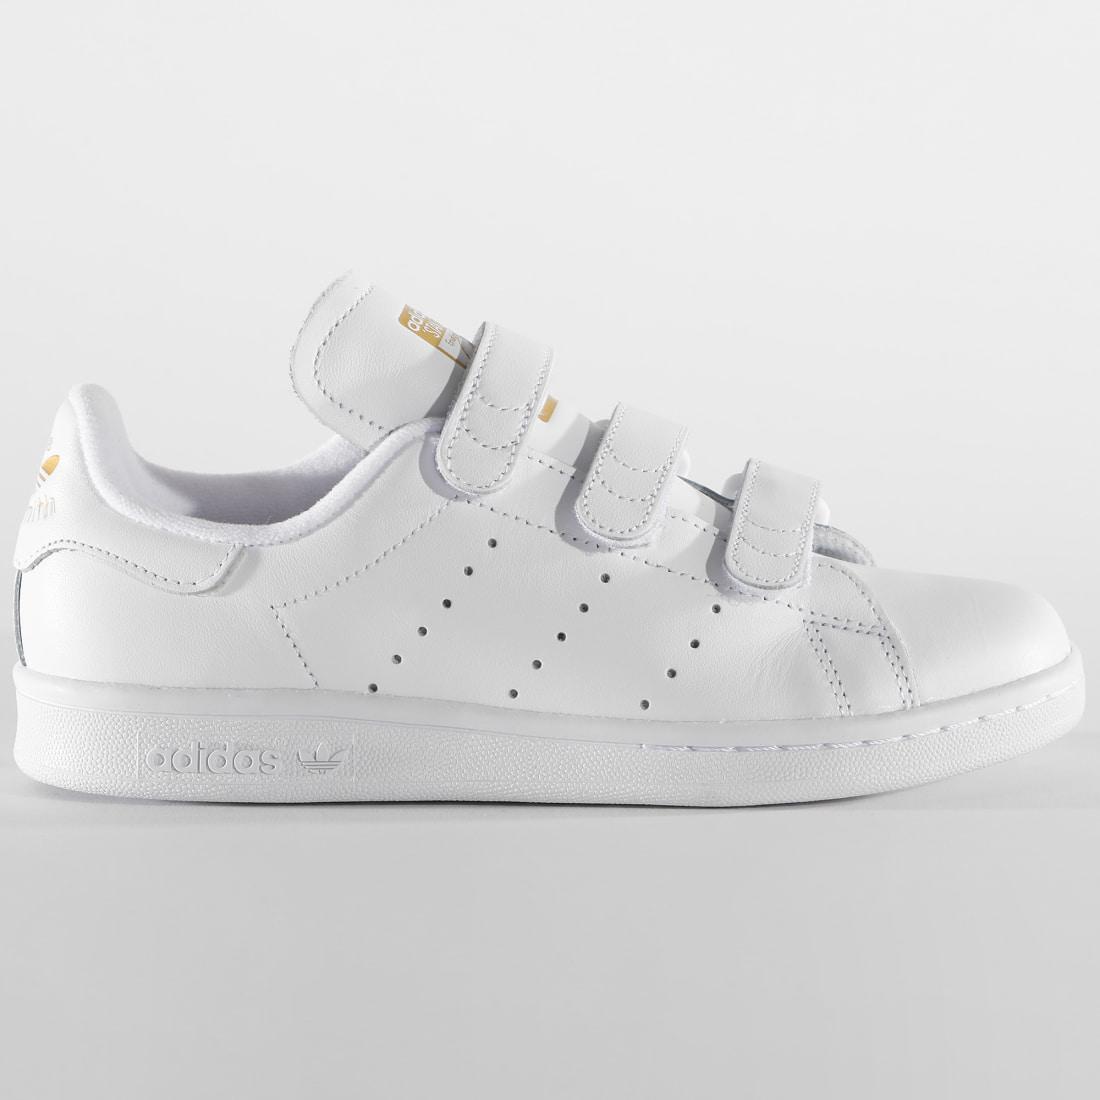 Adidas Stan Smith CF chaussures 5,0 white/white/gold